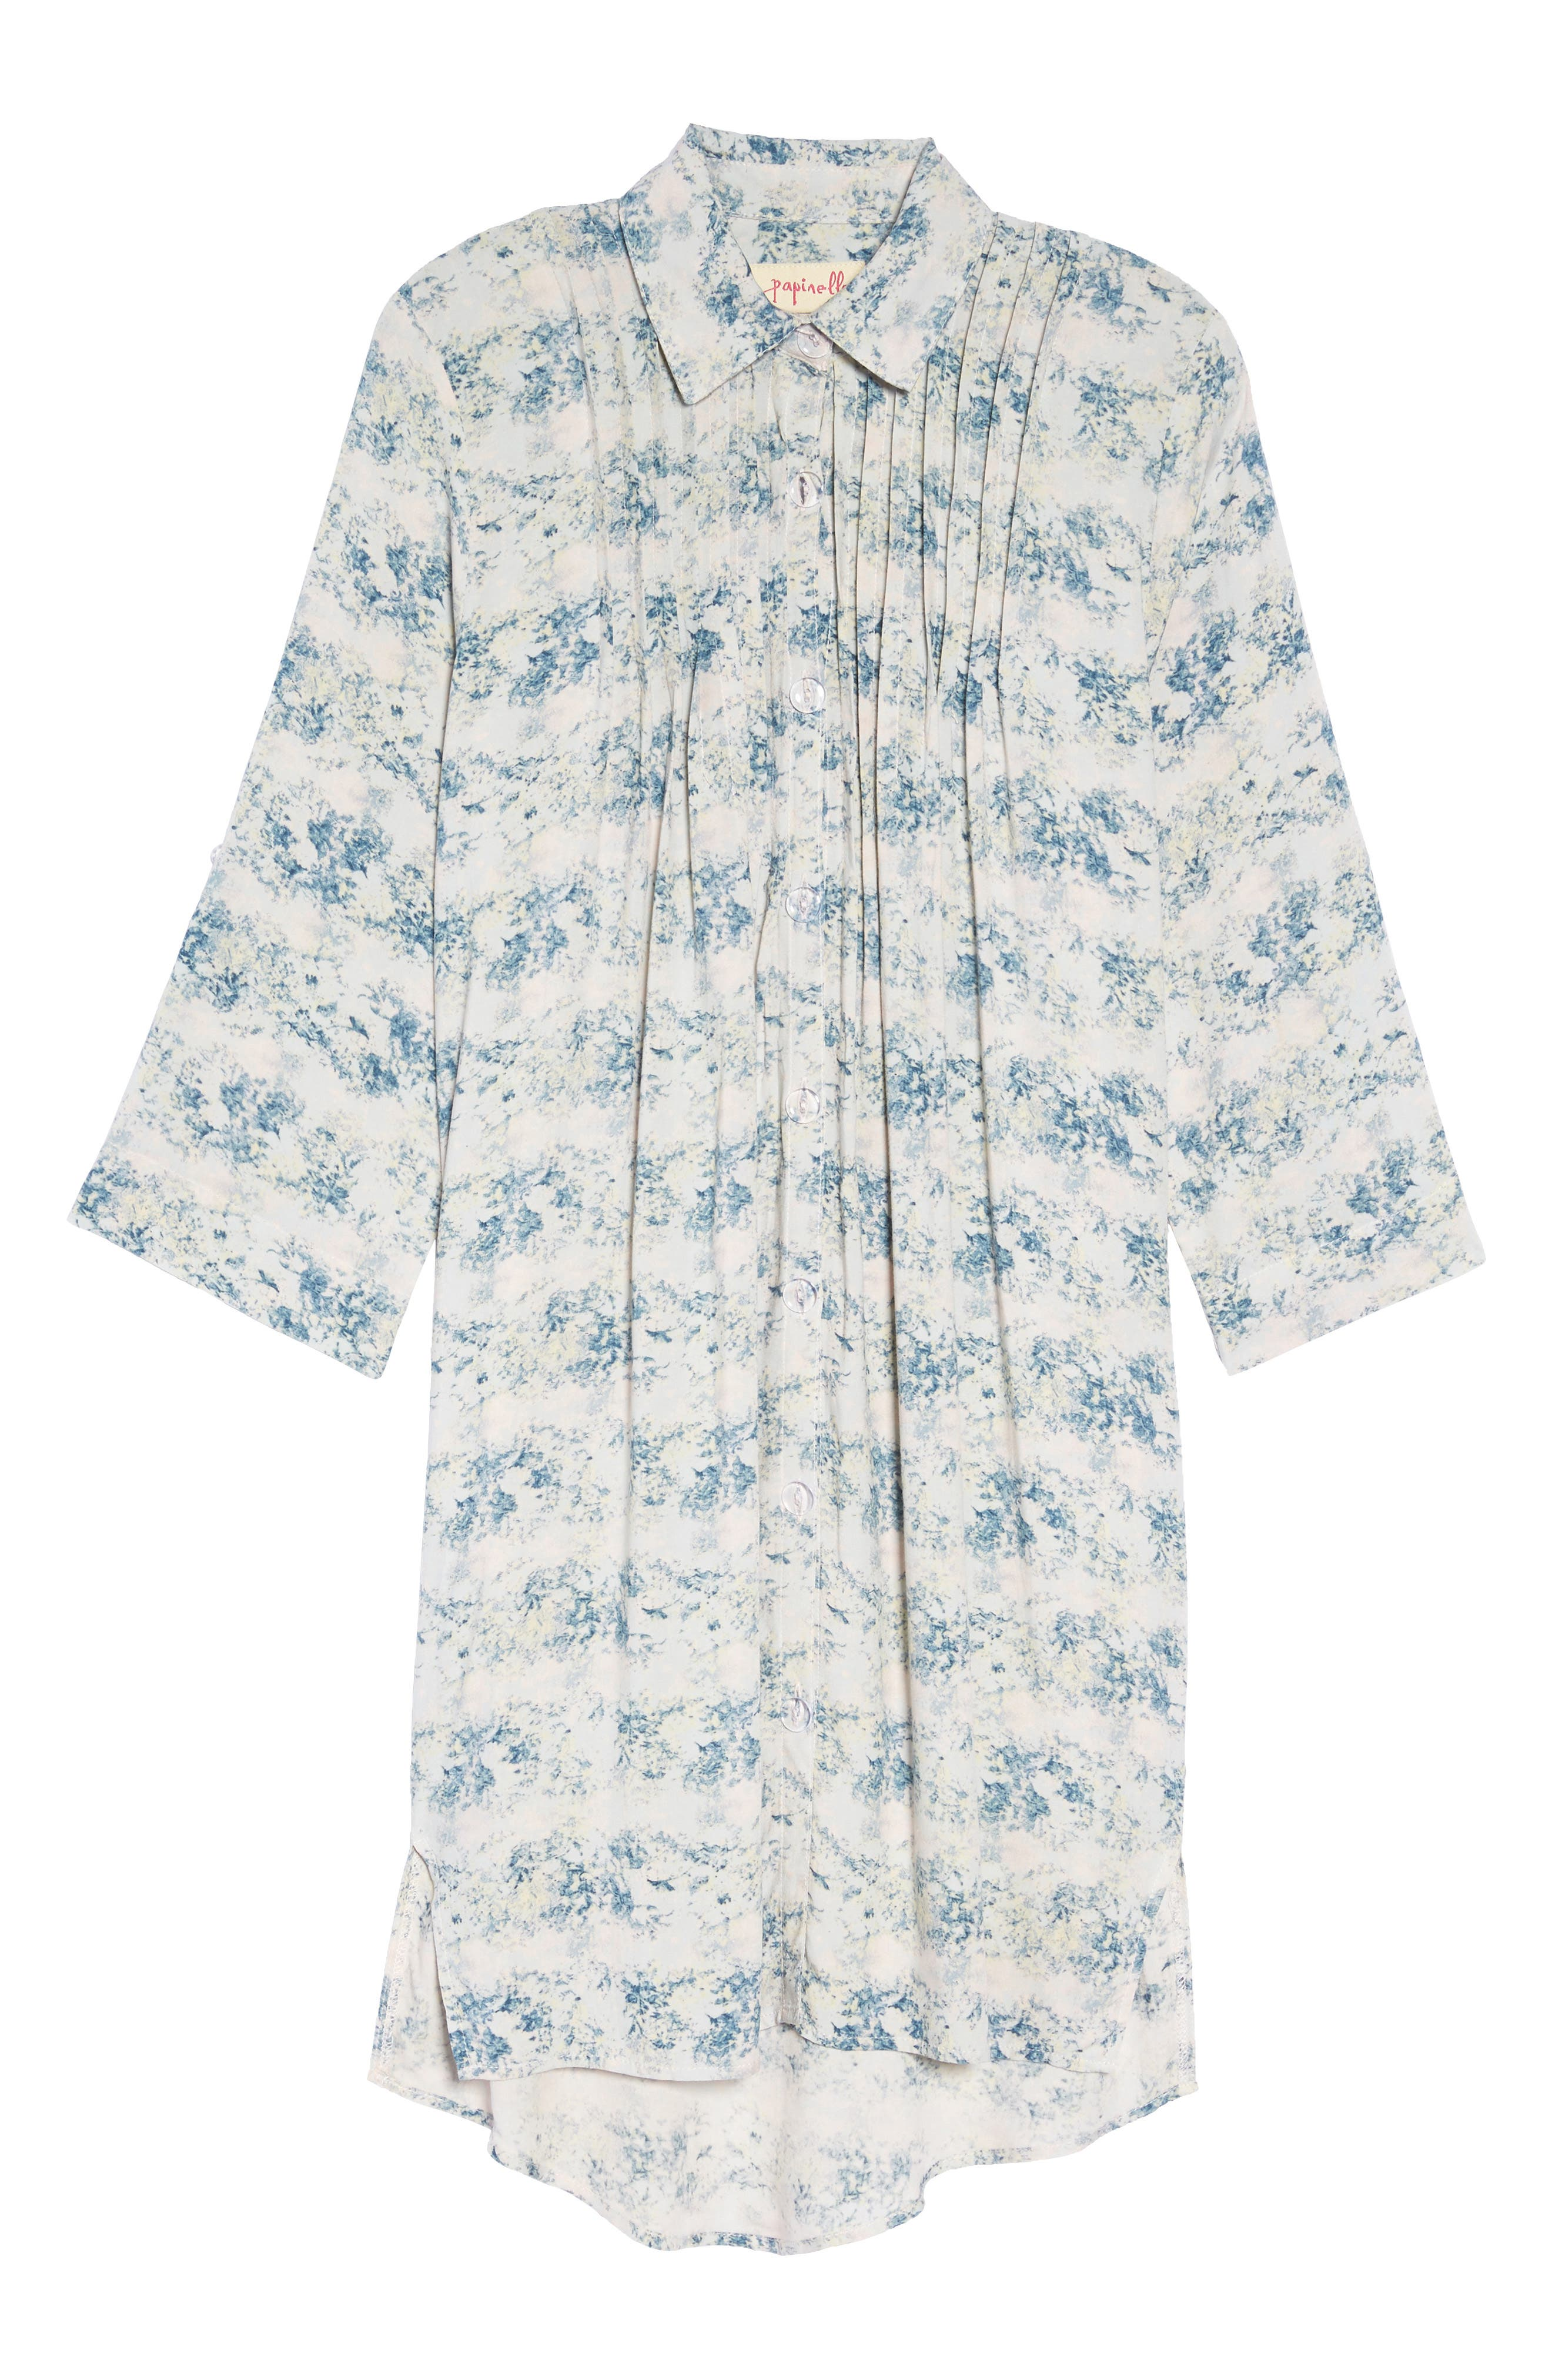 Floral Print Sleep Shirt,                             Alternate thumbnail 6, color,                             403